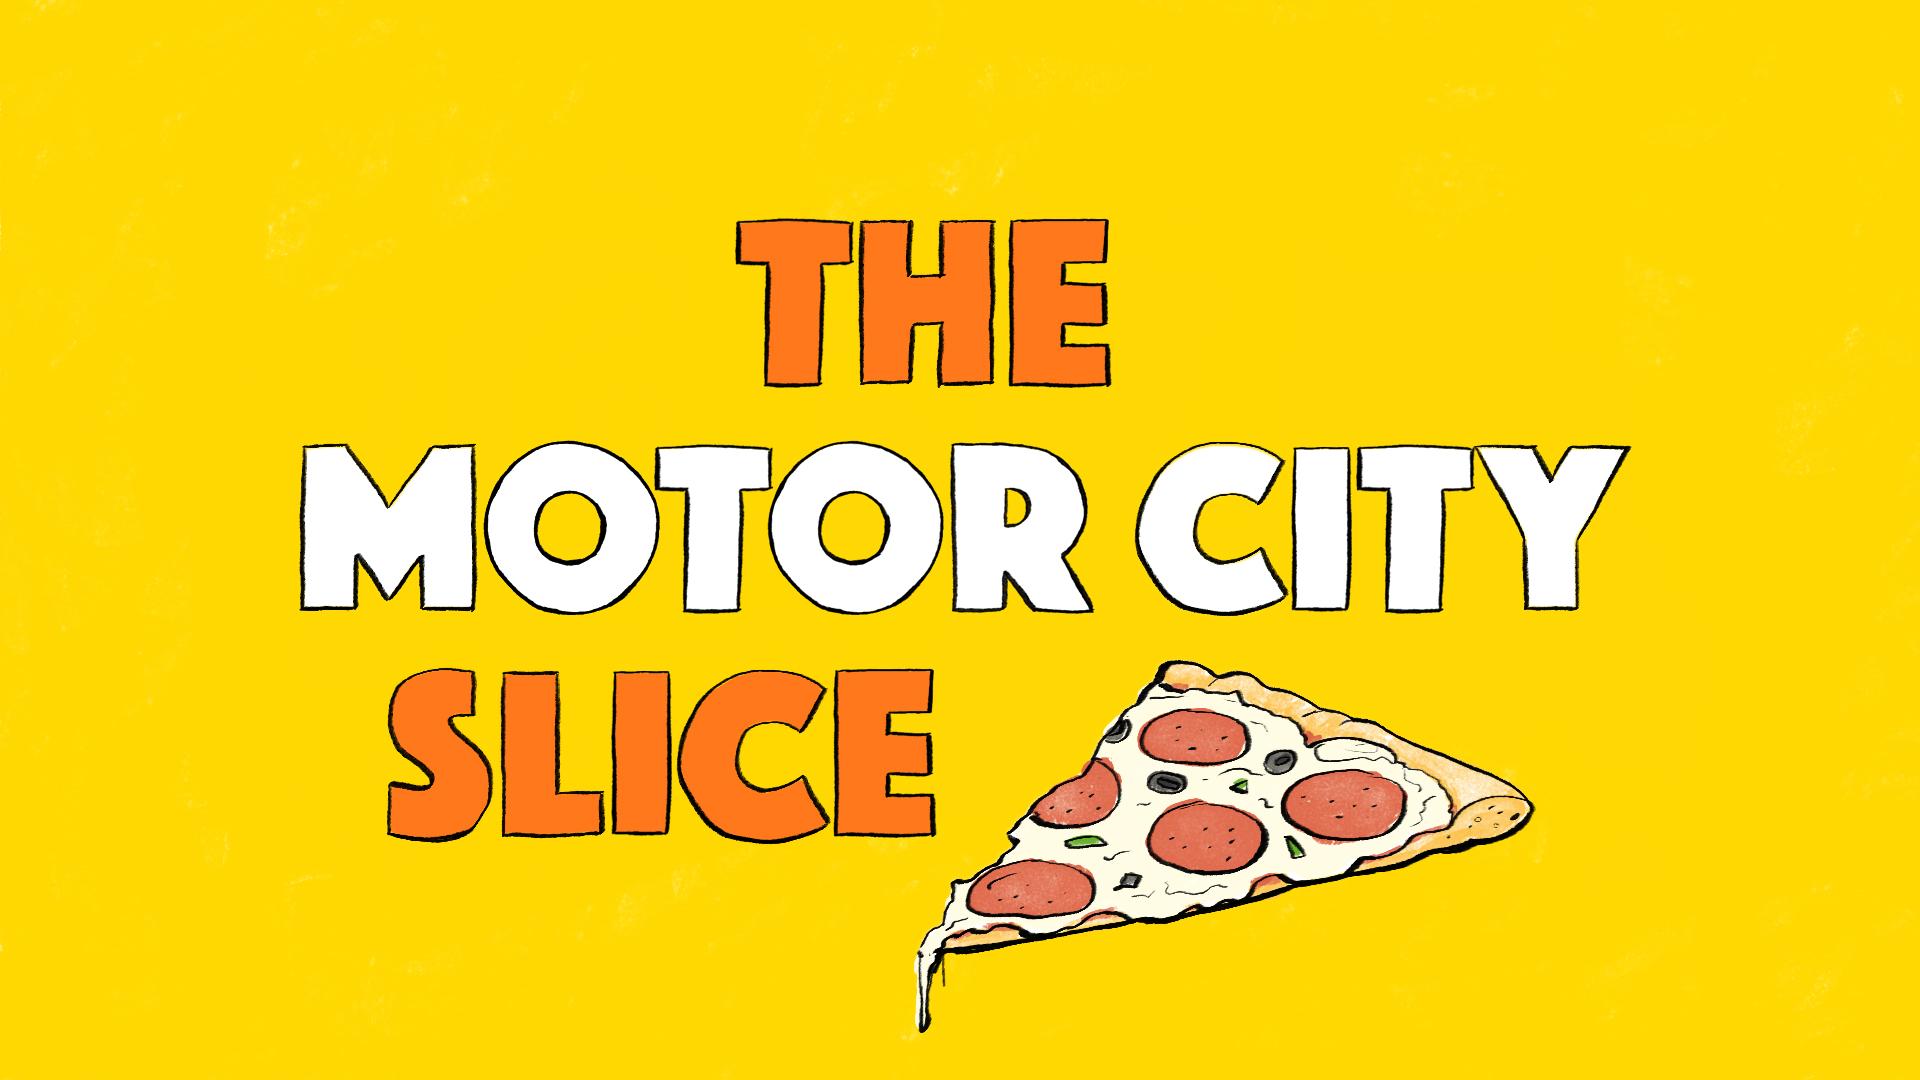 Motor City Slice